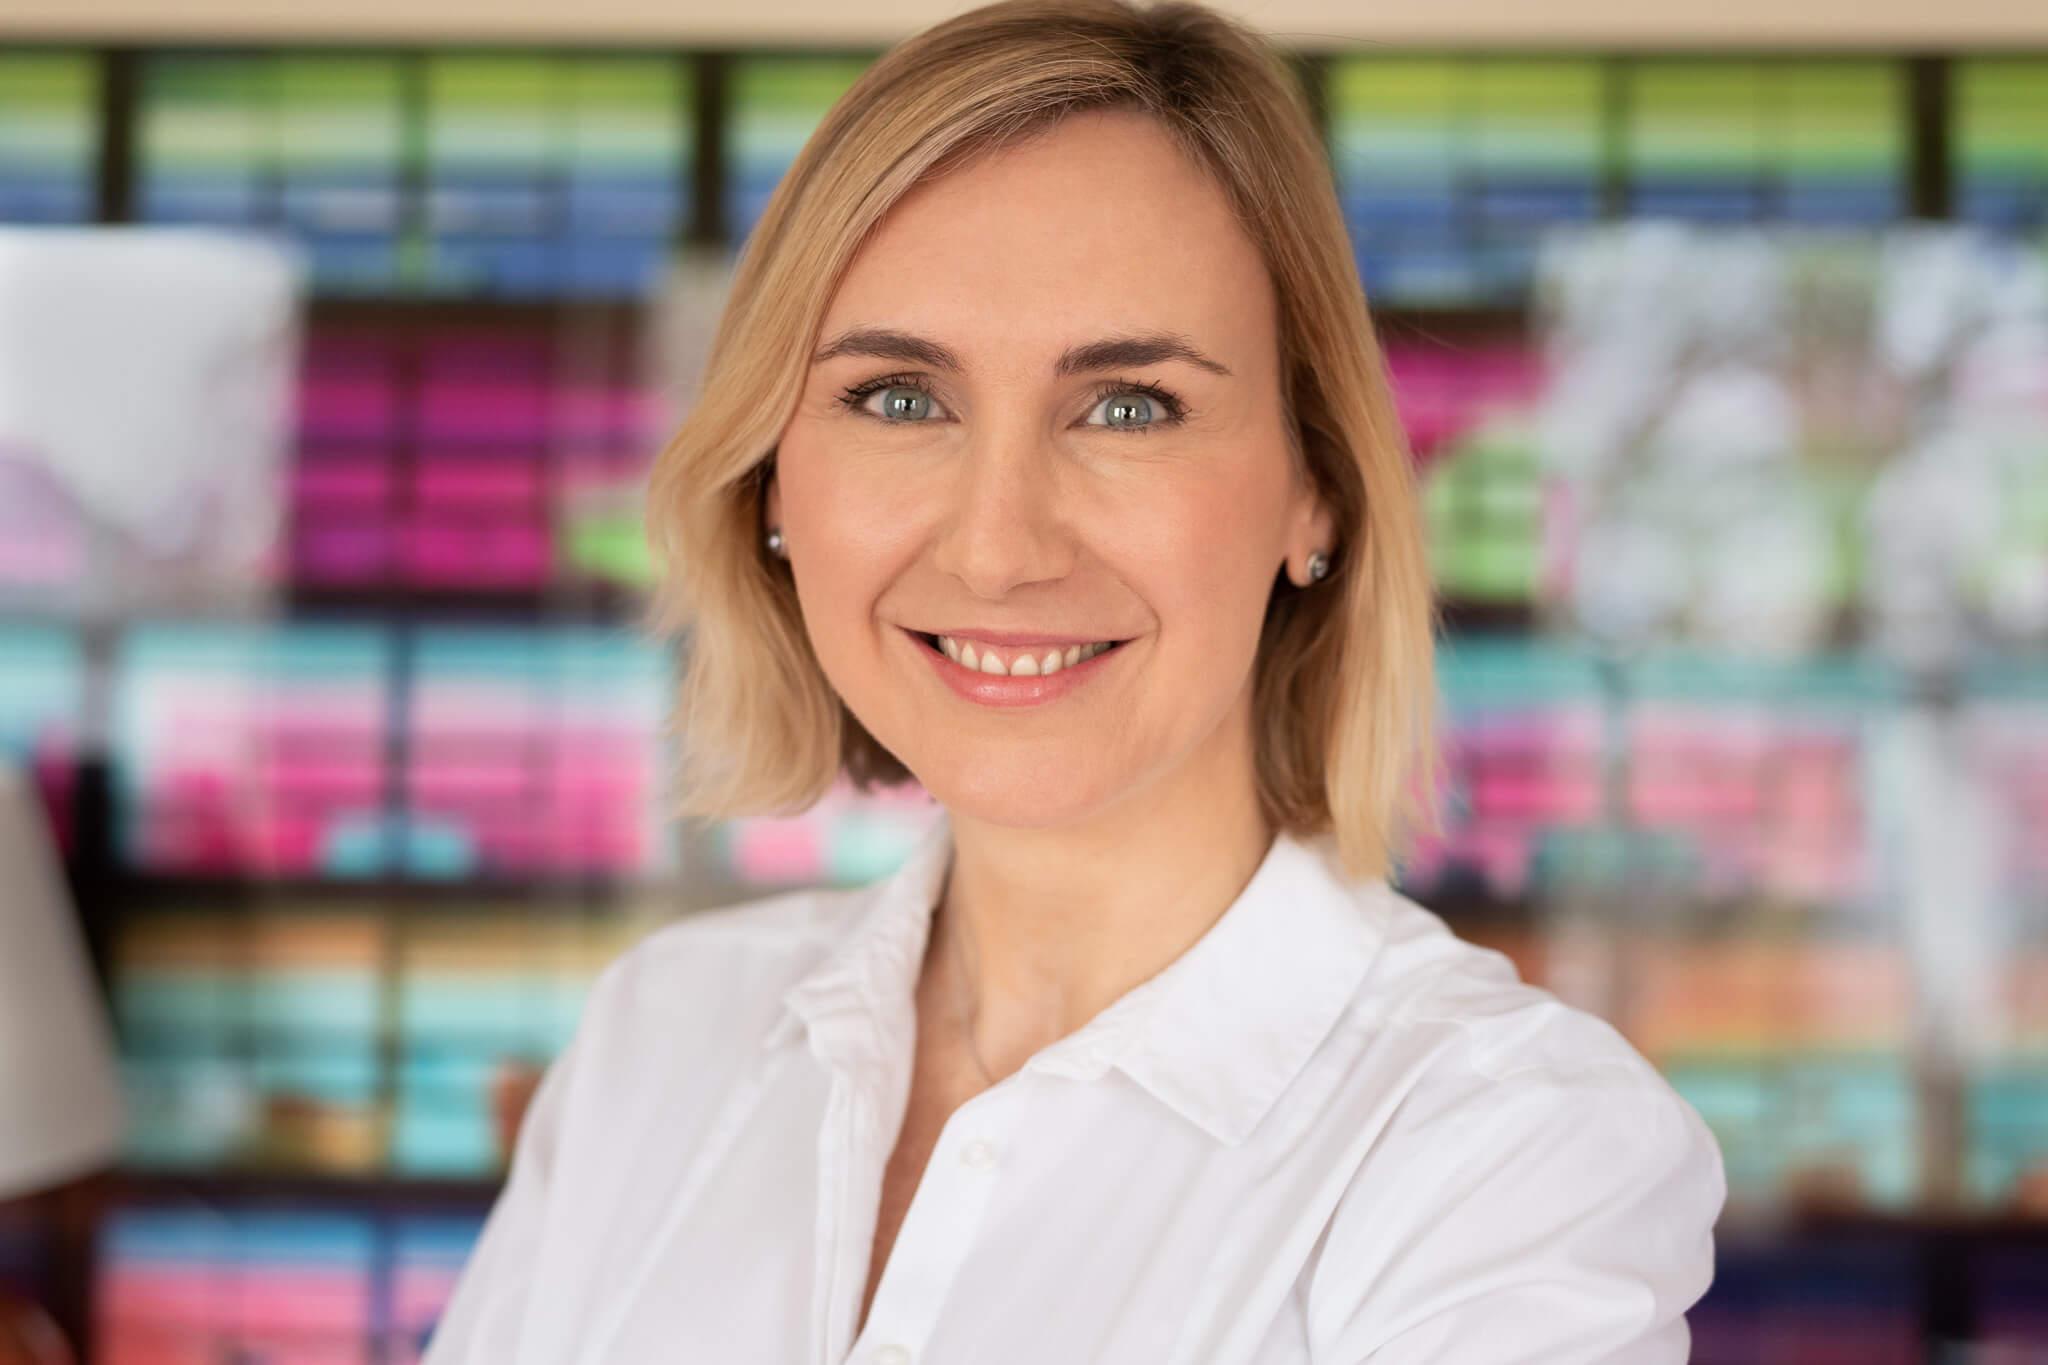 Professional Headshots London - Carine Bea: Corporate